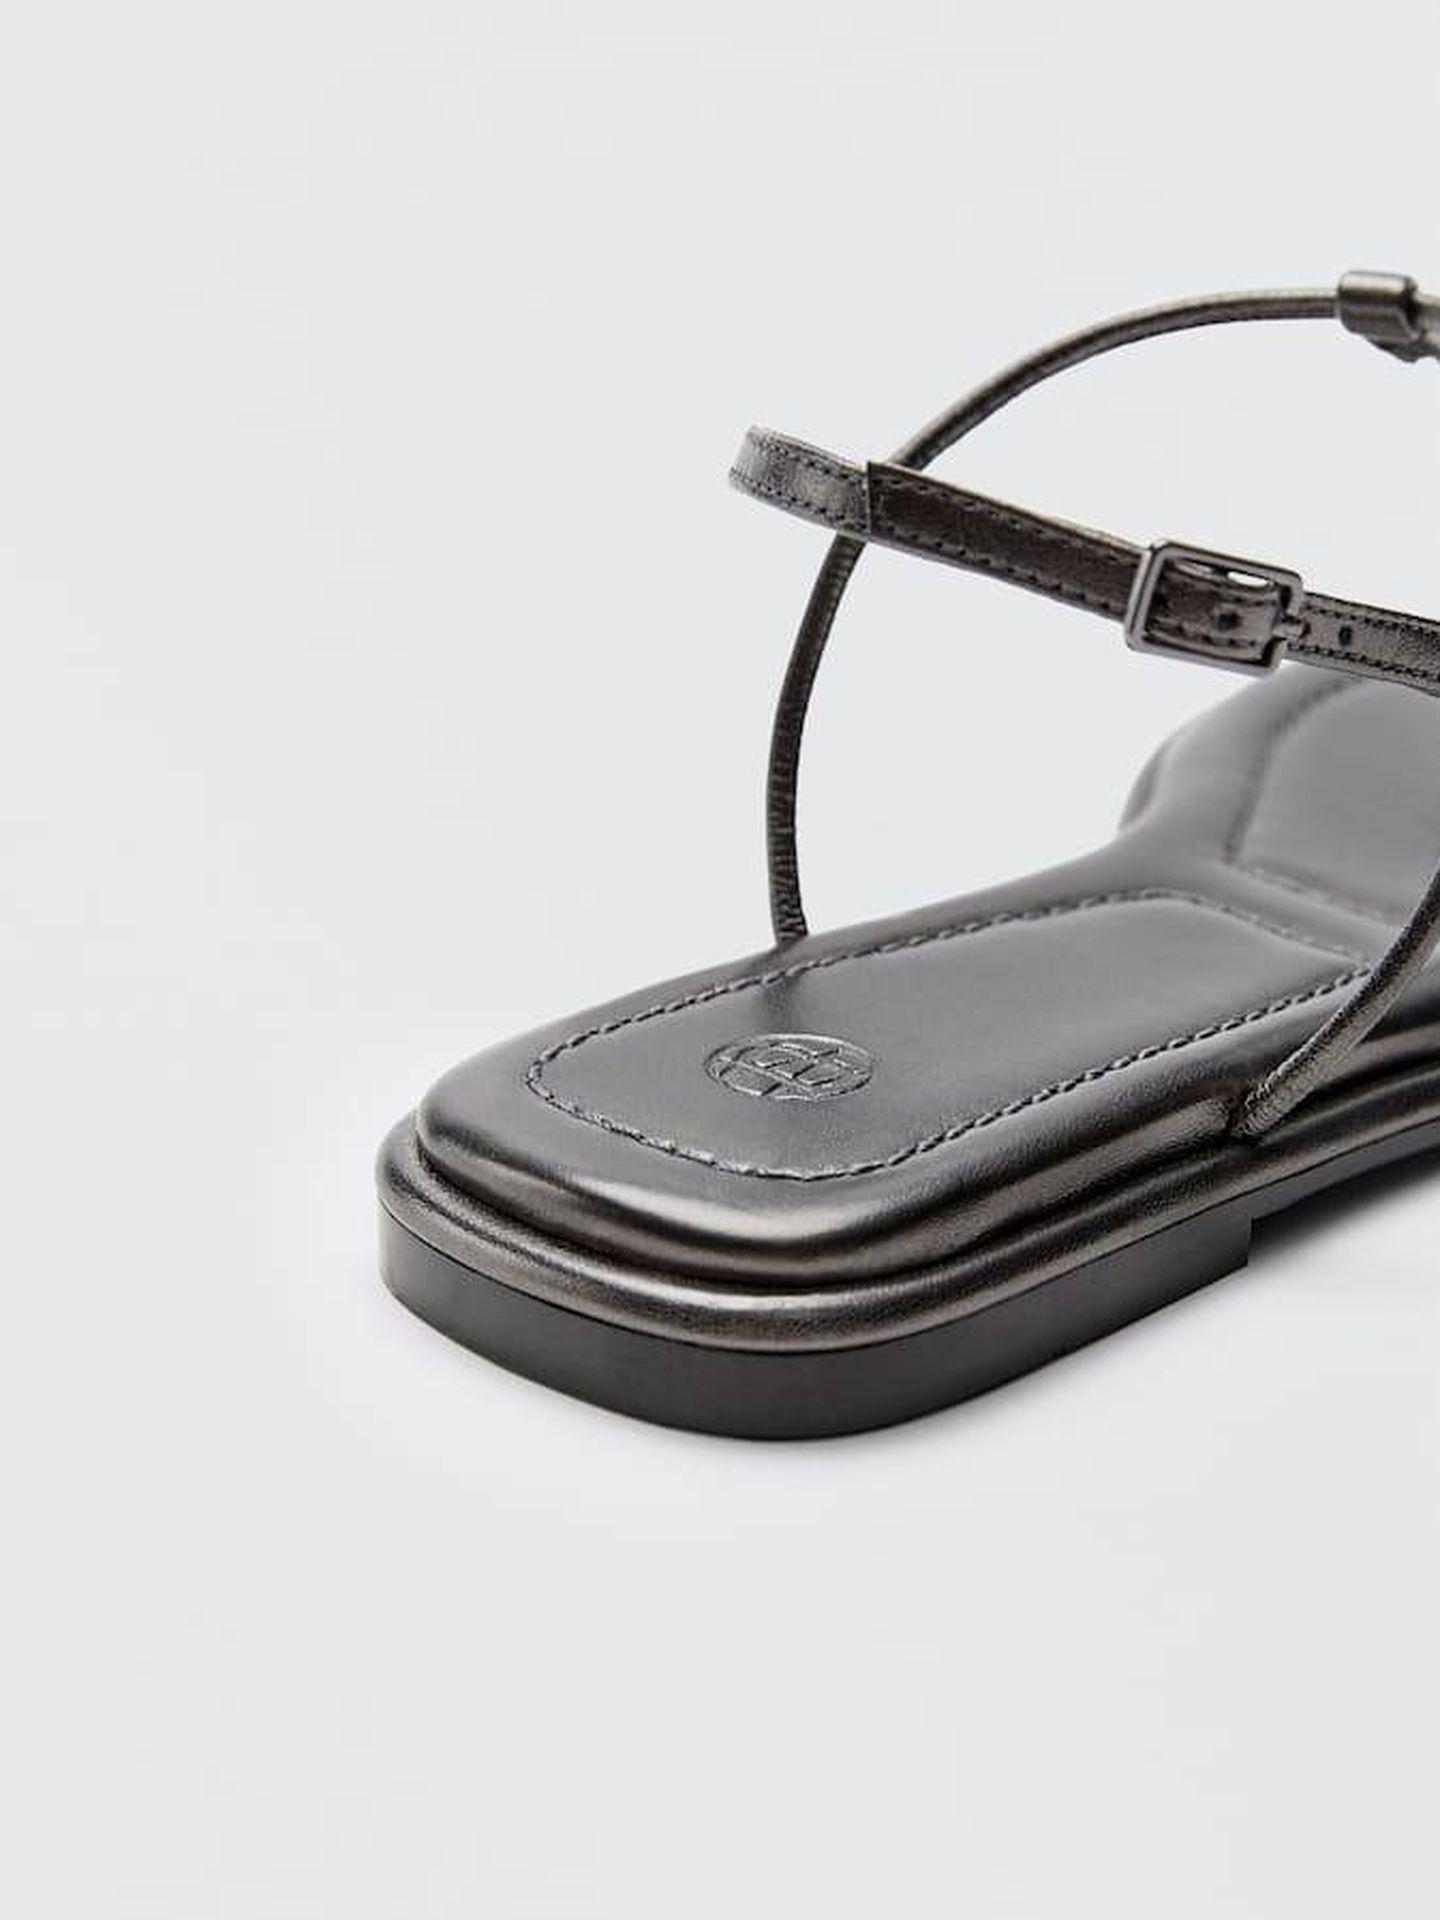 Sandalia plana de Massimo Dutti. (Cortesía)